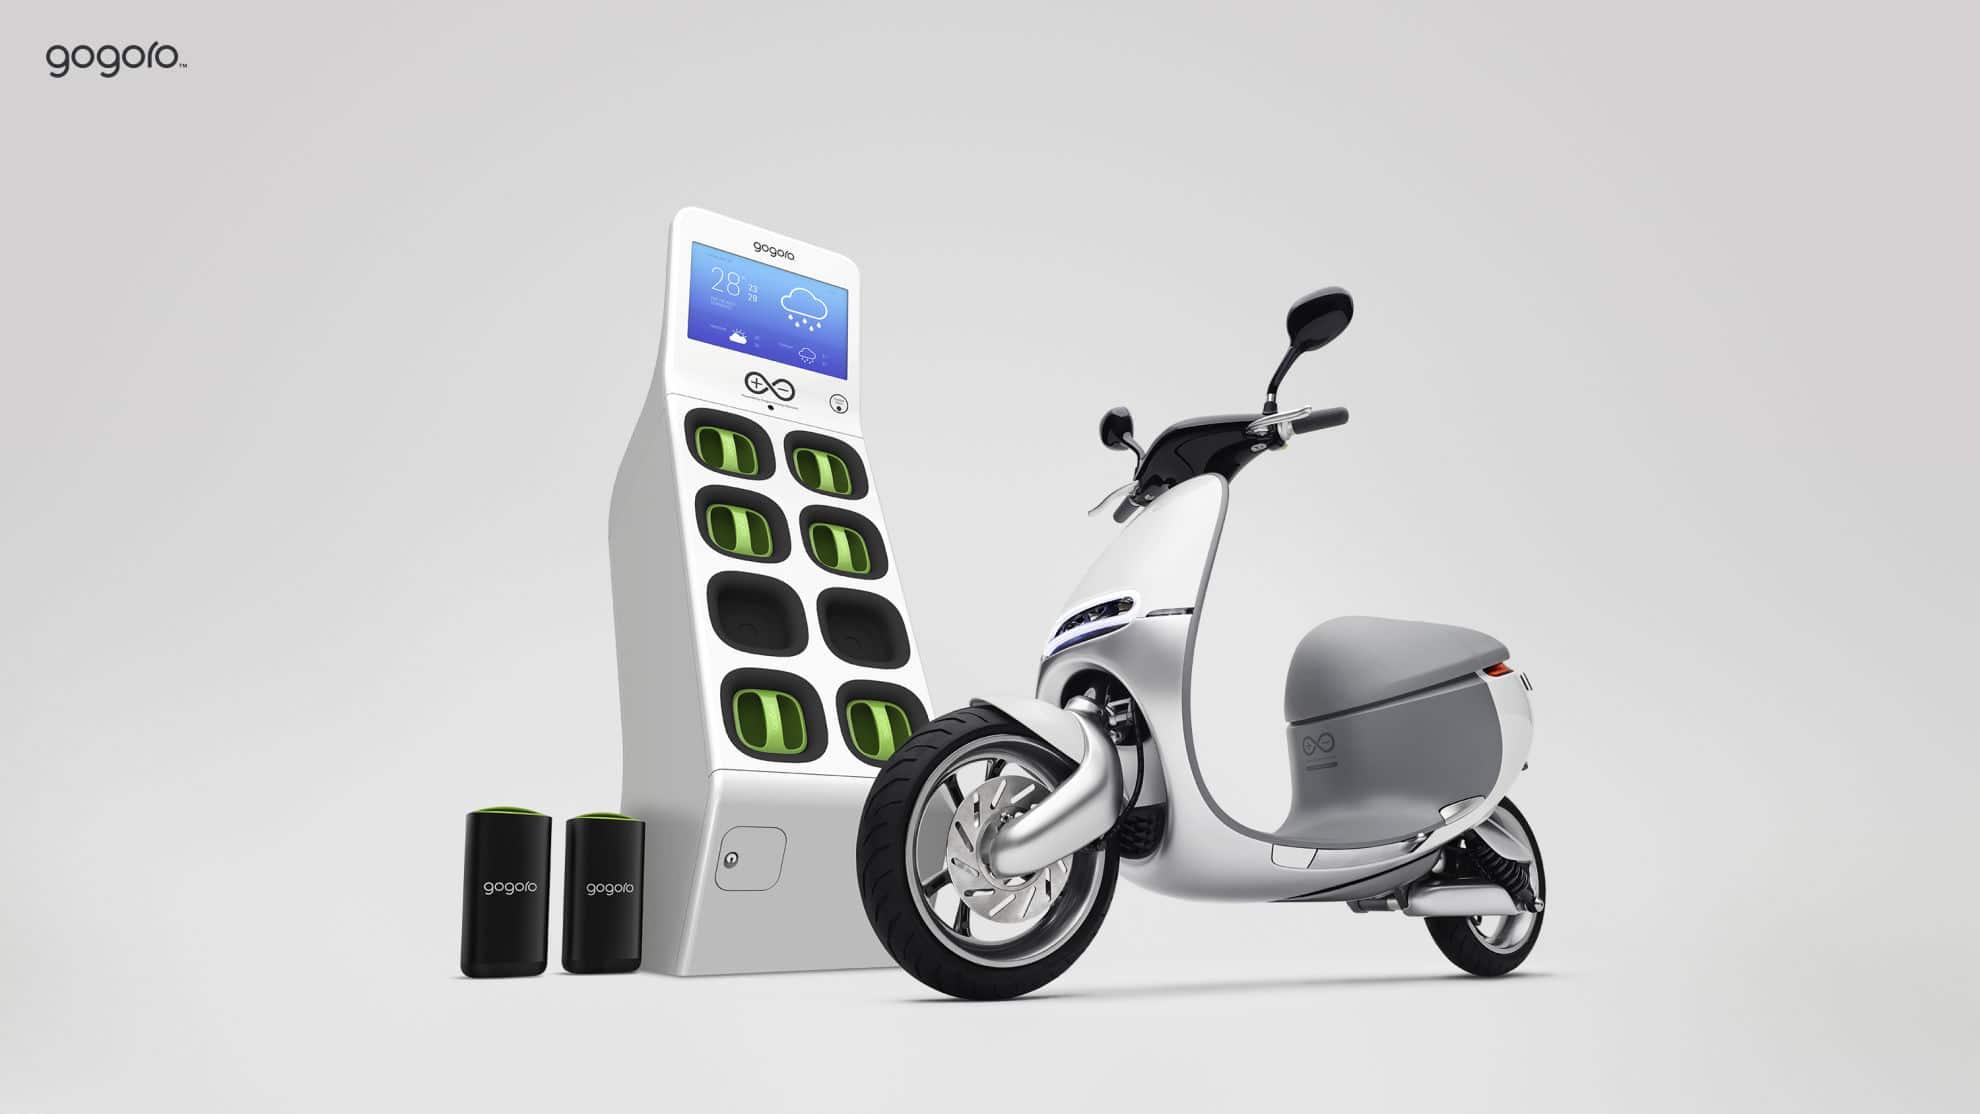 Gogoro Smartscooter